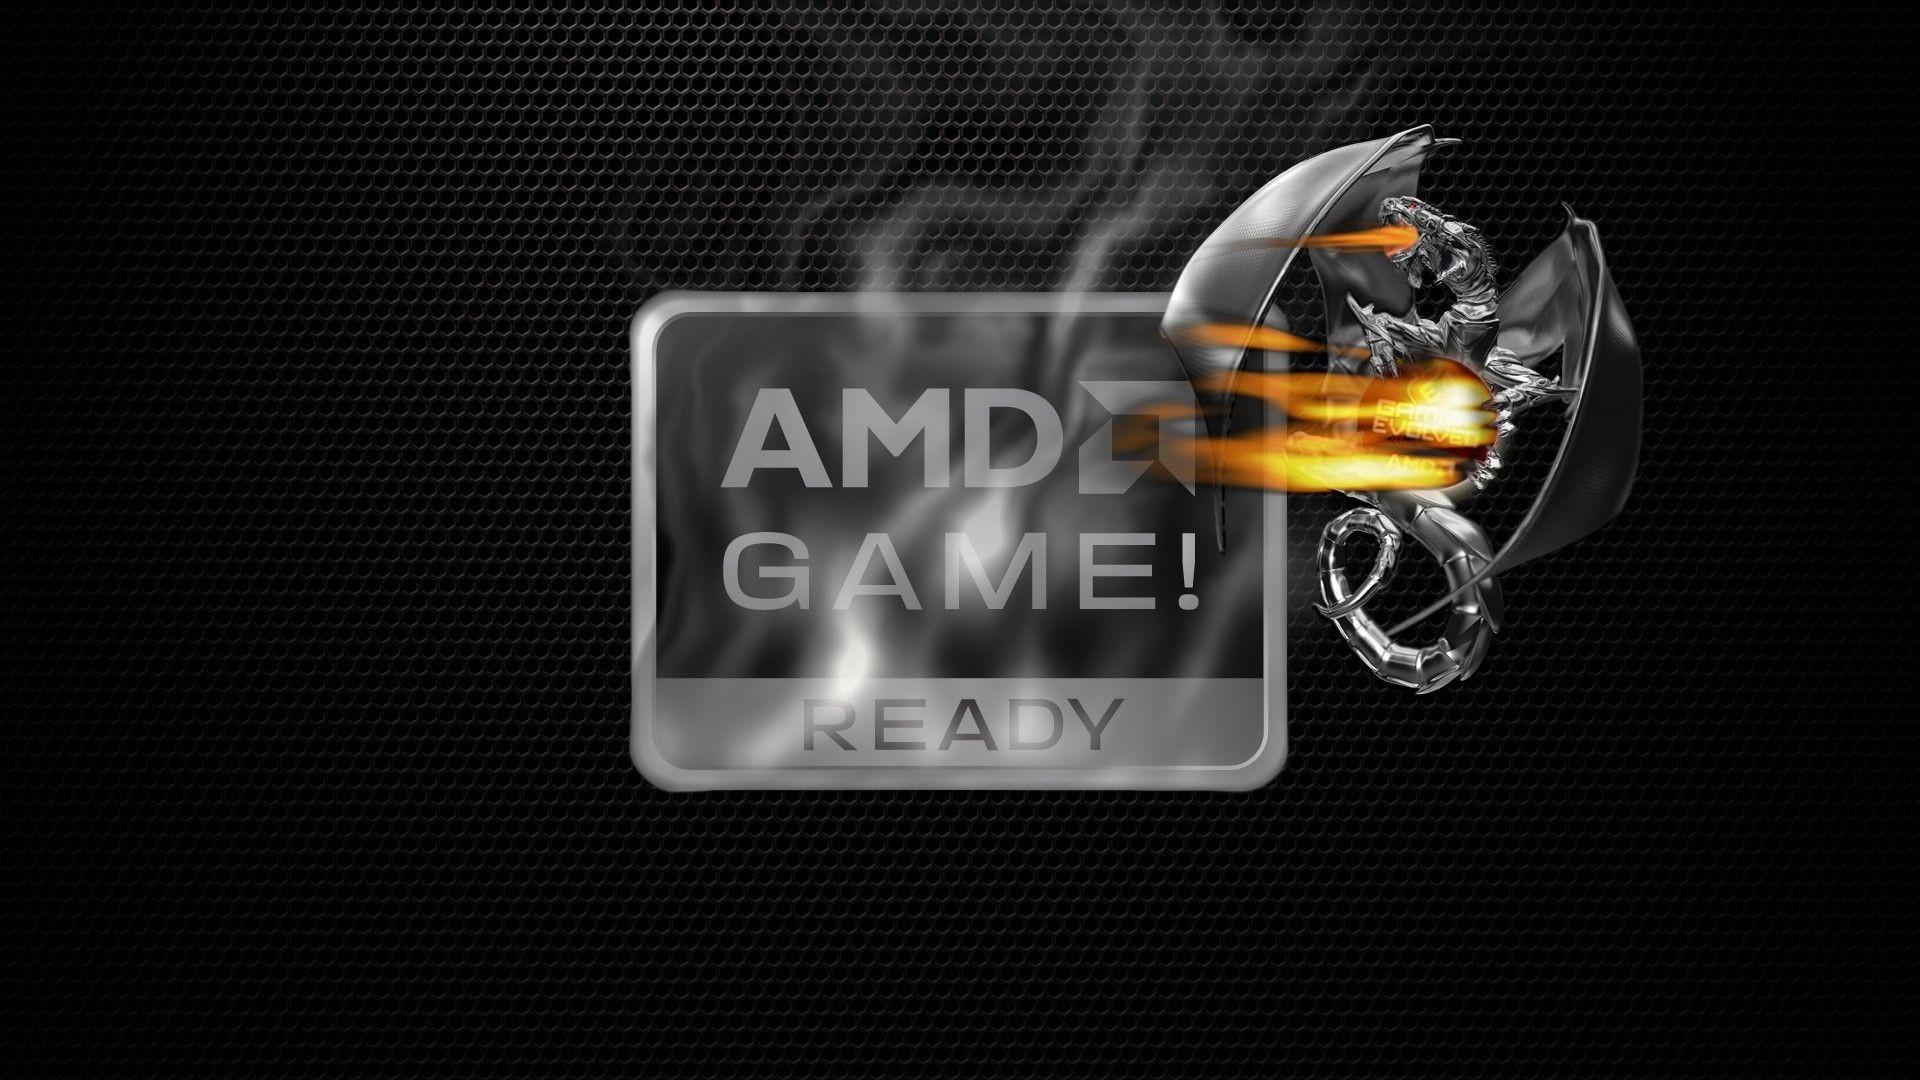 Res: 1920x1080, Amd gaming evolveds dragon wallpaper | AllWallpaper.in #430 | PC | en